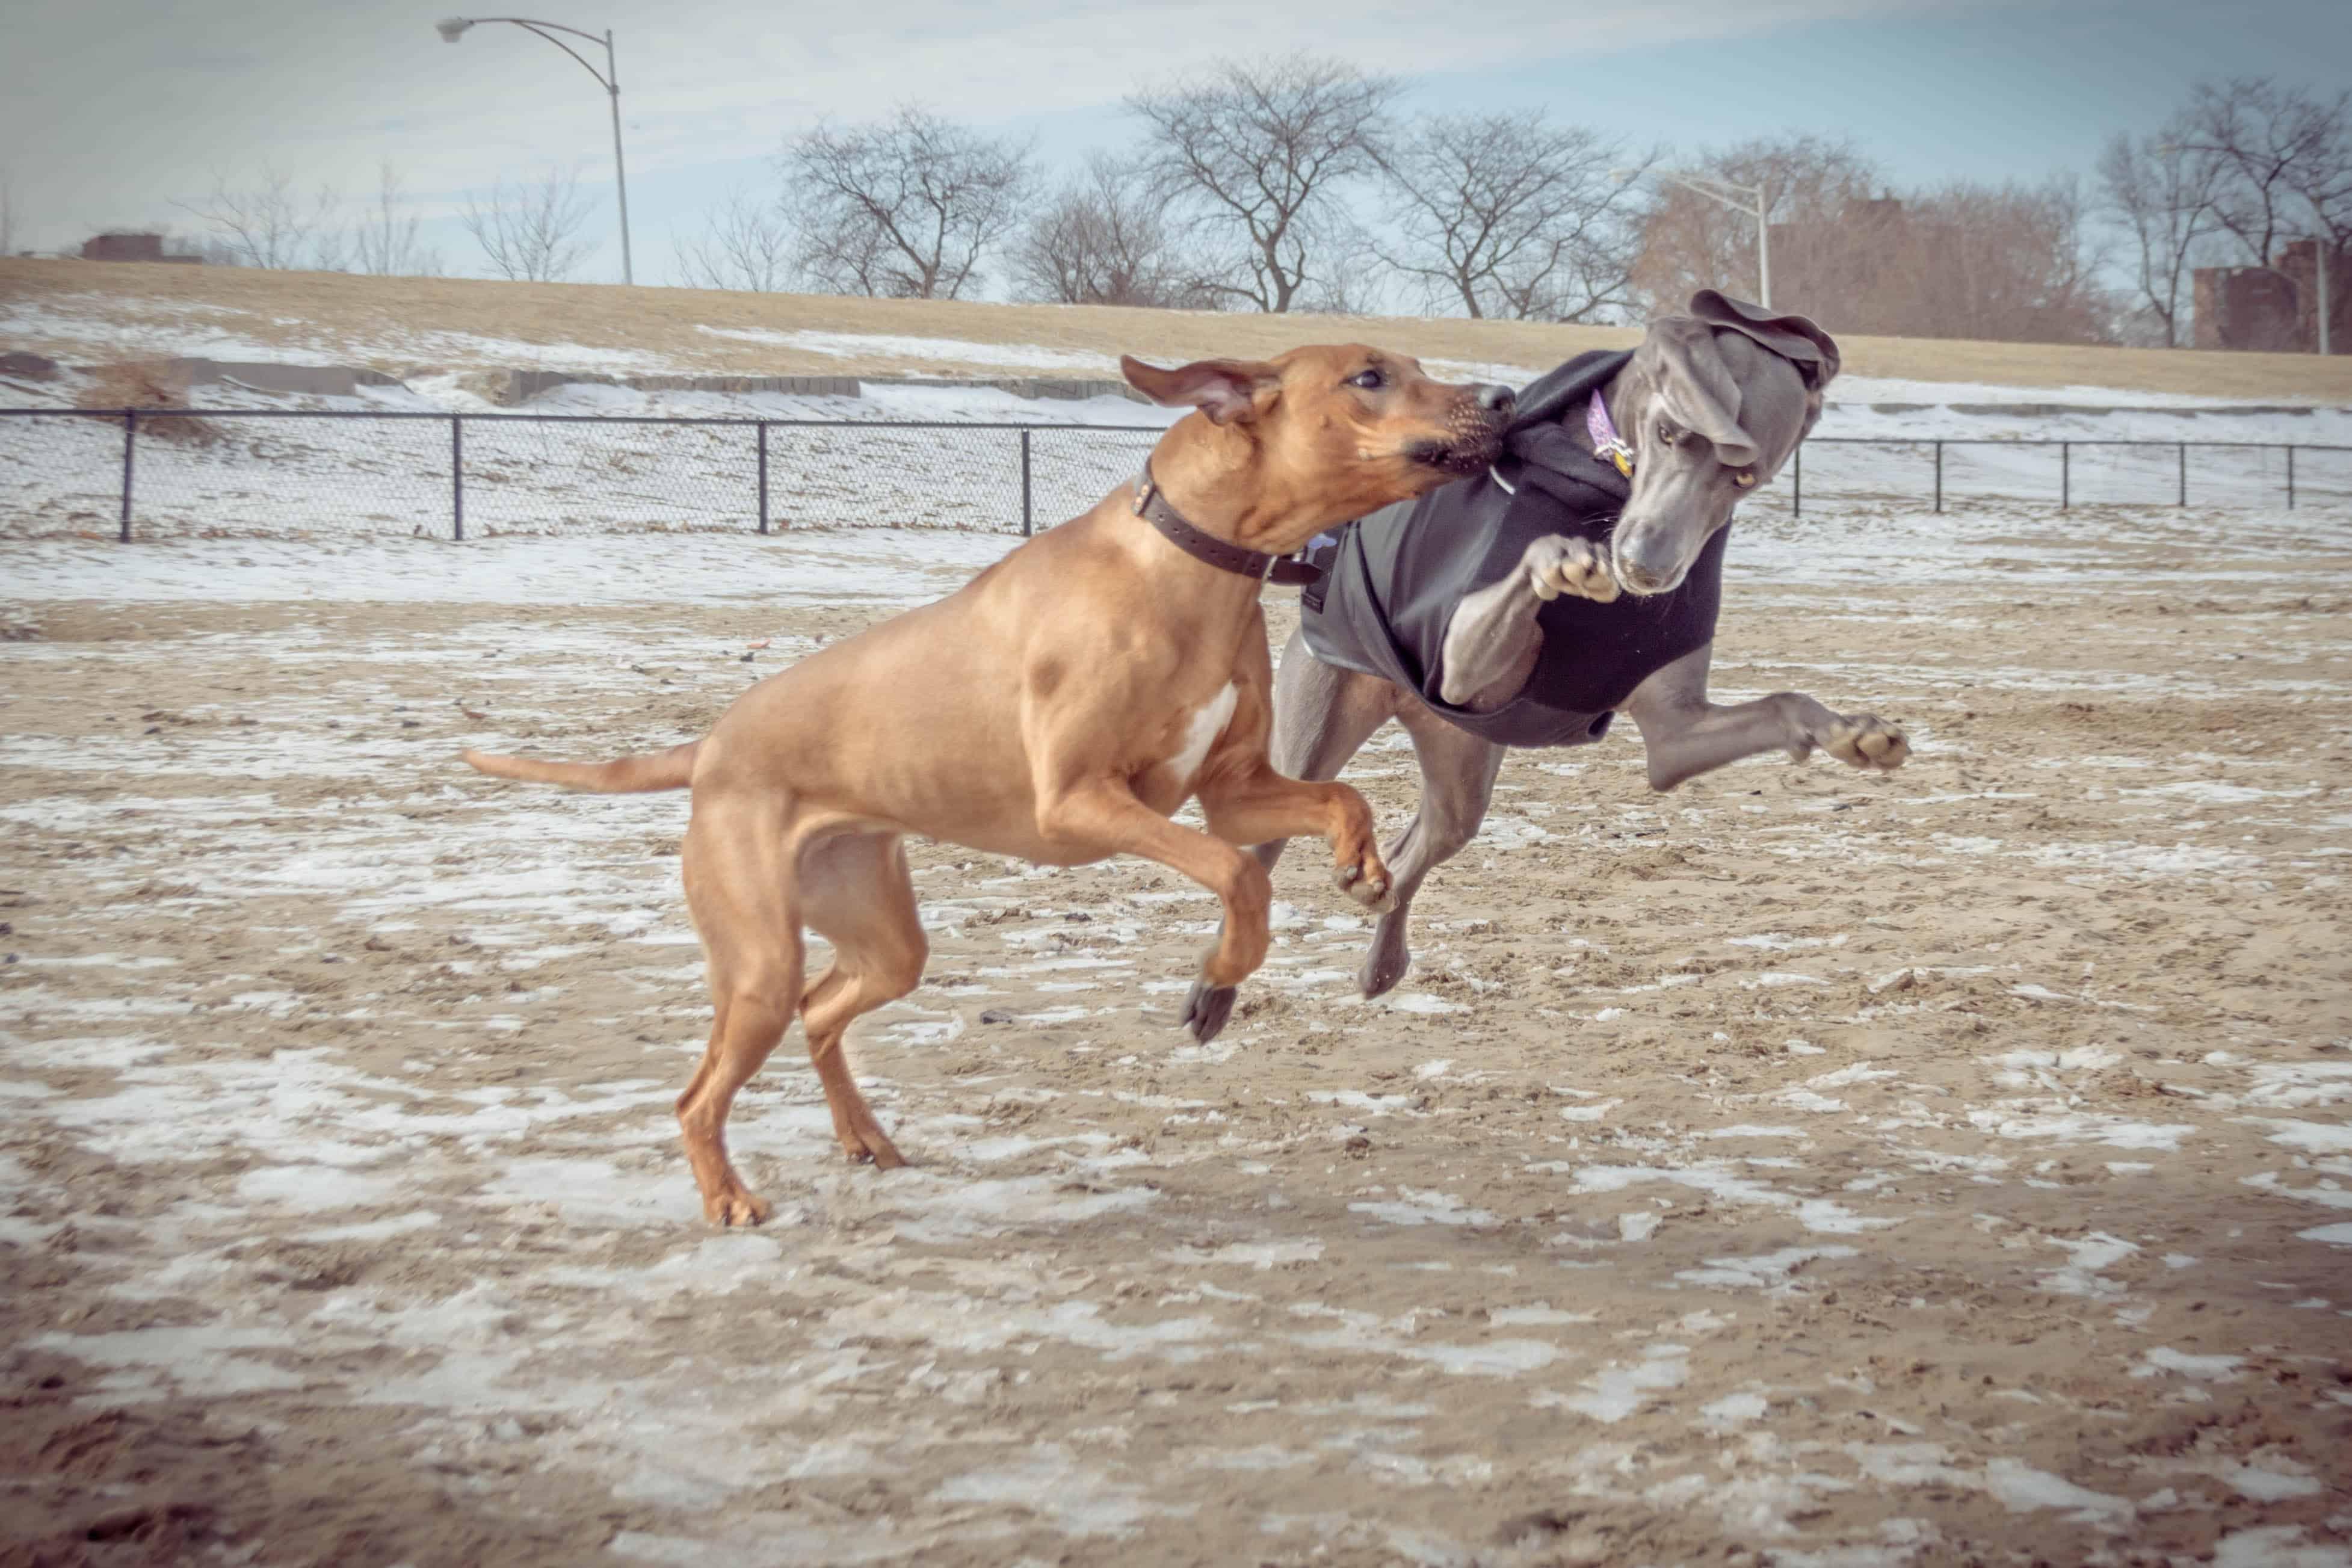 Rhodesian Ridgeback, puppy, dog beach, montrose dog beach, chicago,